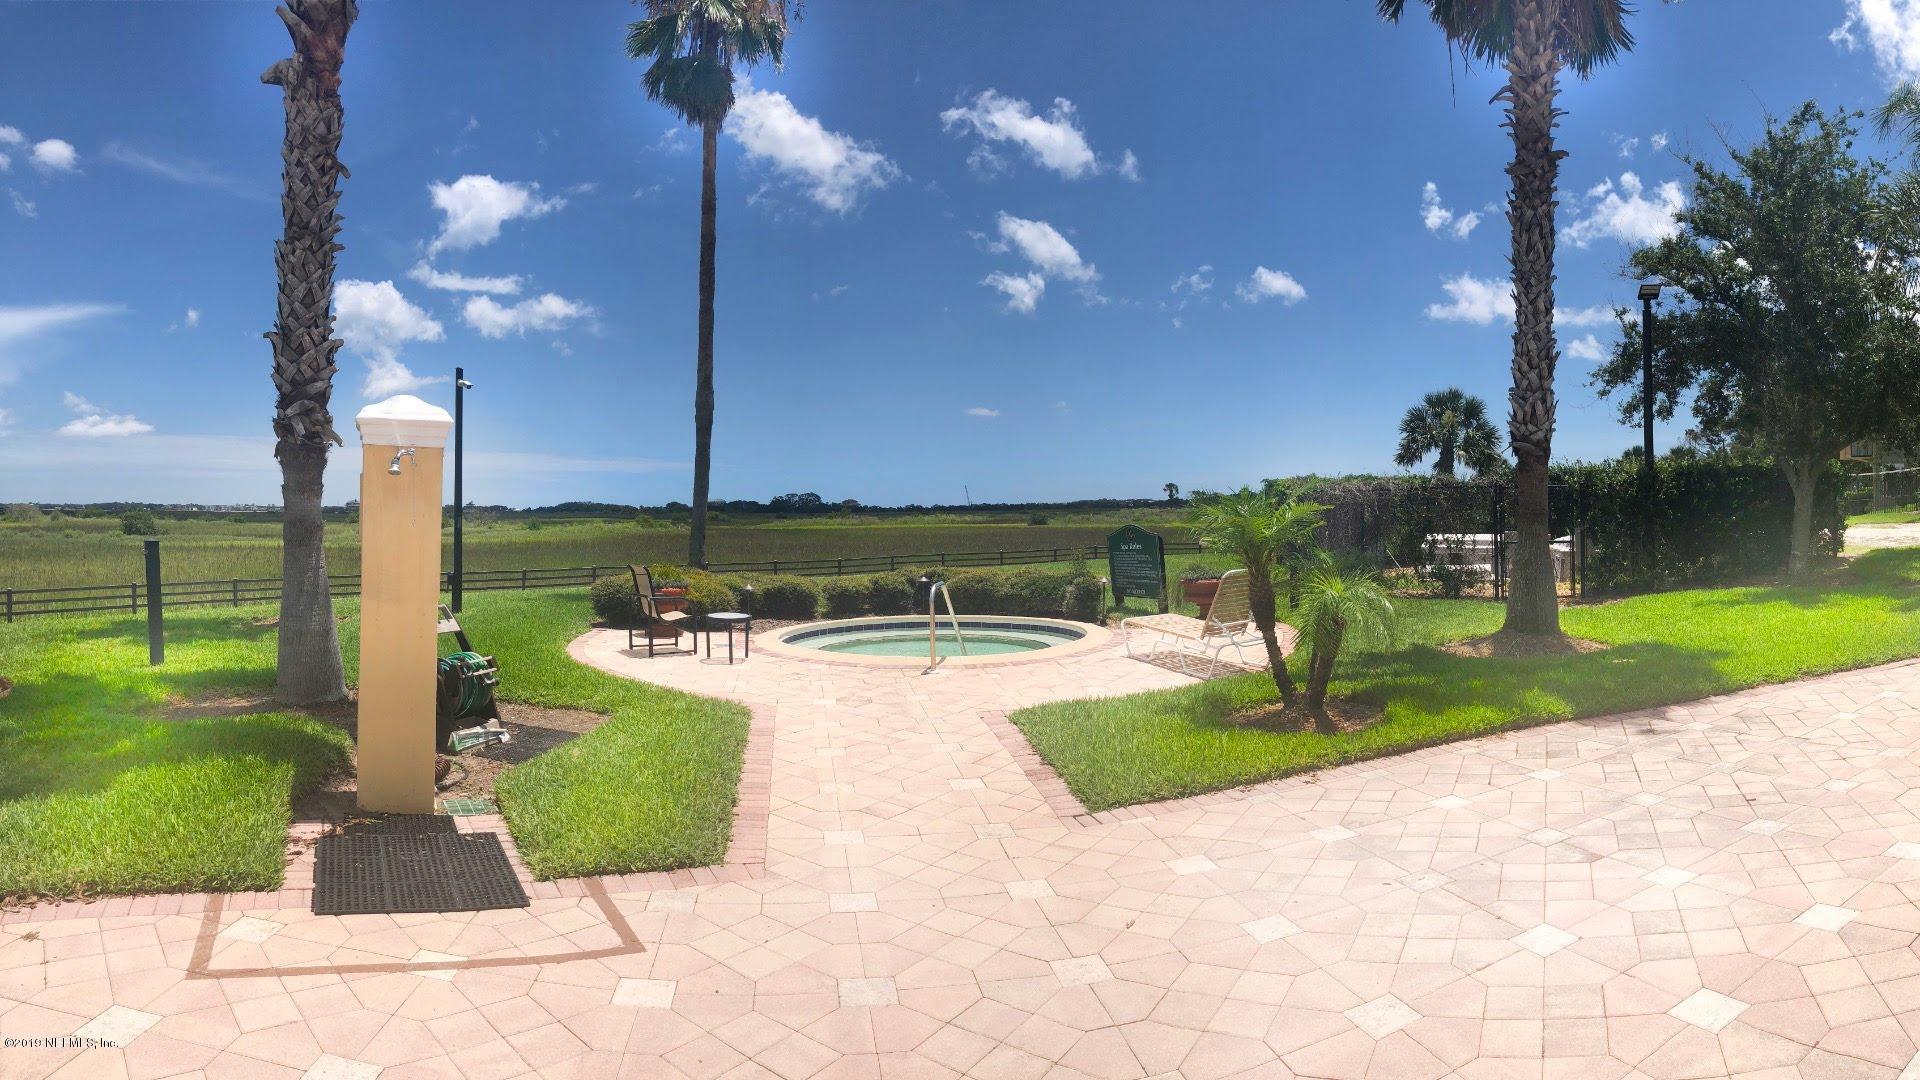 4035 GRANDE VISTA- ST AUGUSTINE- FLORIDA 32084, 3 Bedrooms Bedrooms, ,2 BathroomsBathrooms,Condo,For sale,GRANDE VISTA,1018781